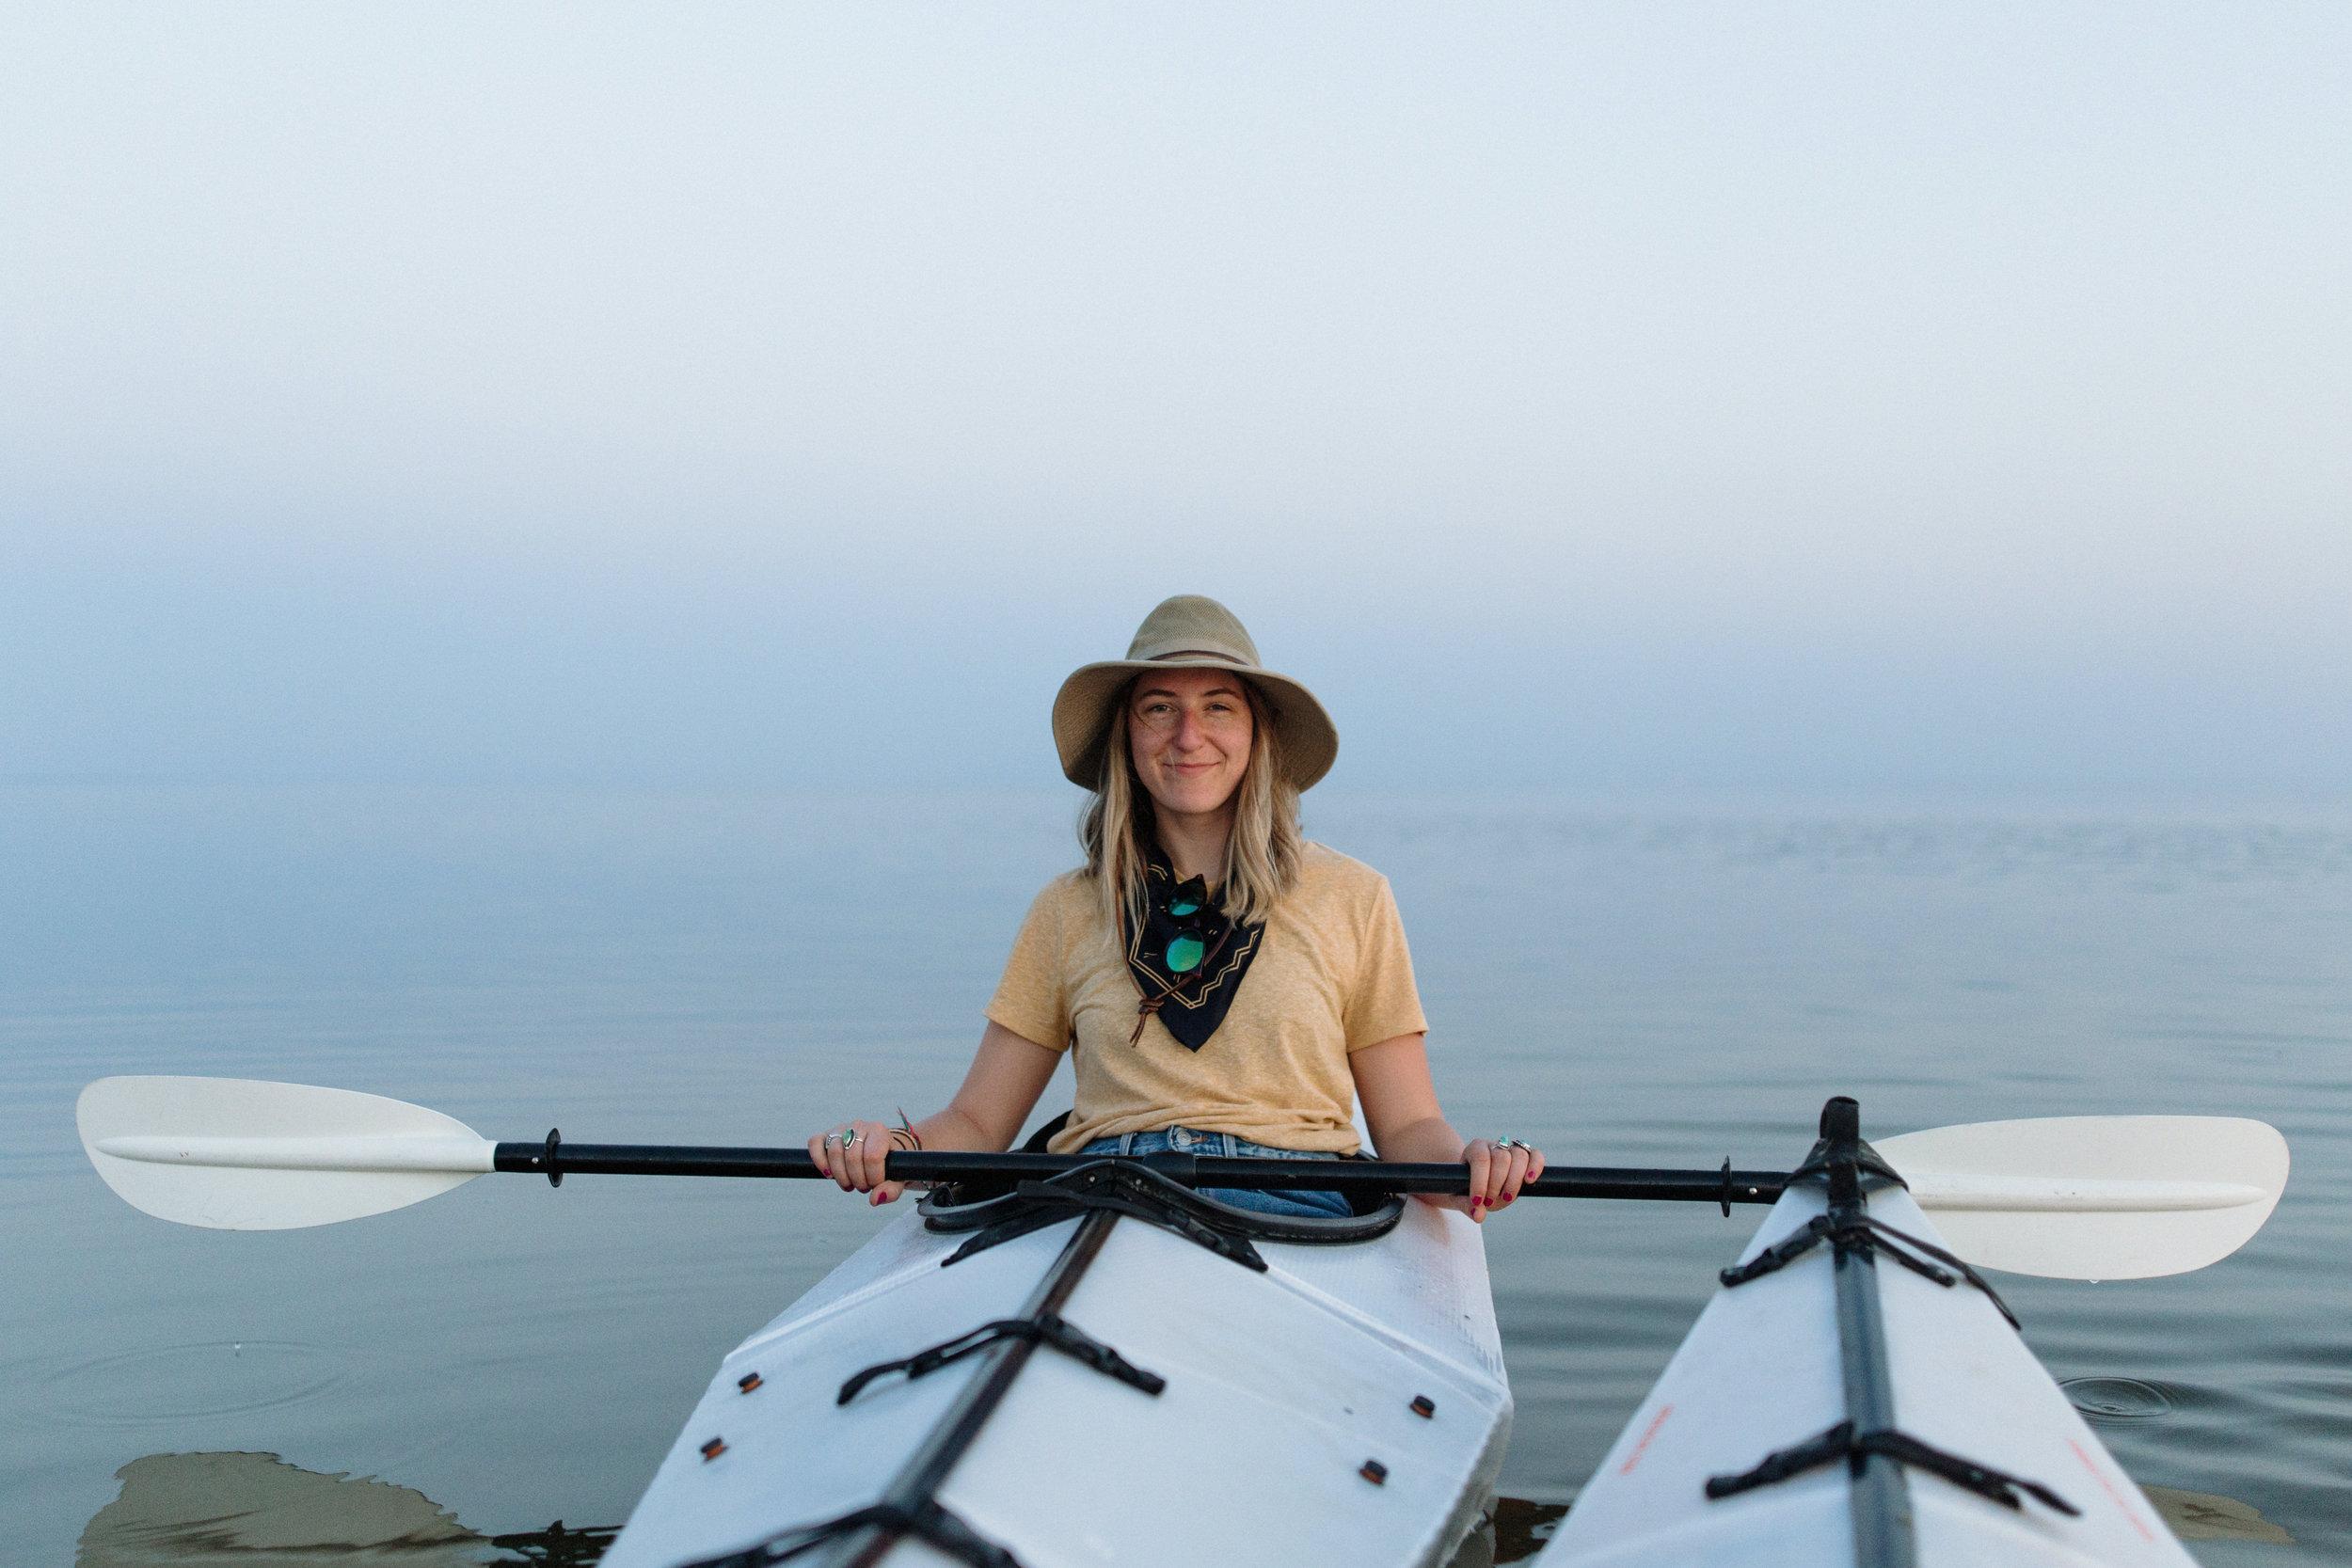 04:11 — Balkin_Oru Kayak_Salton Sea-0050.jpg